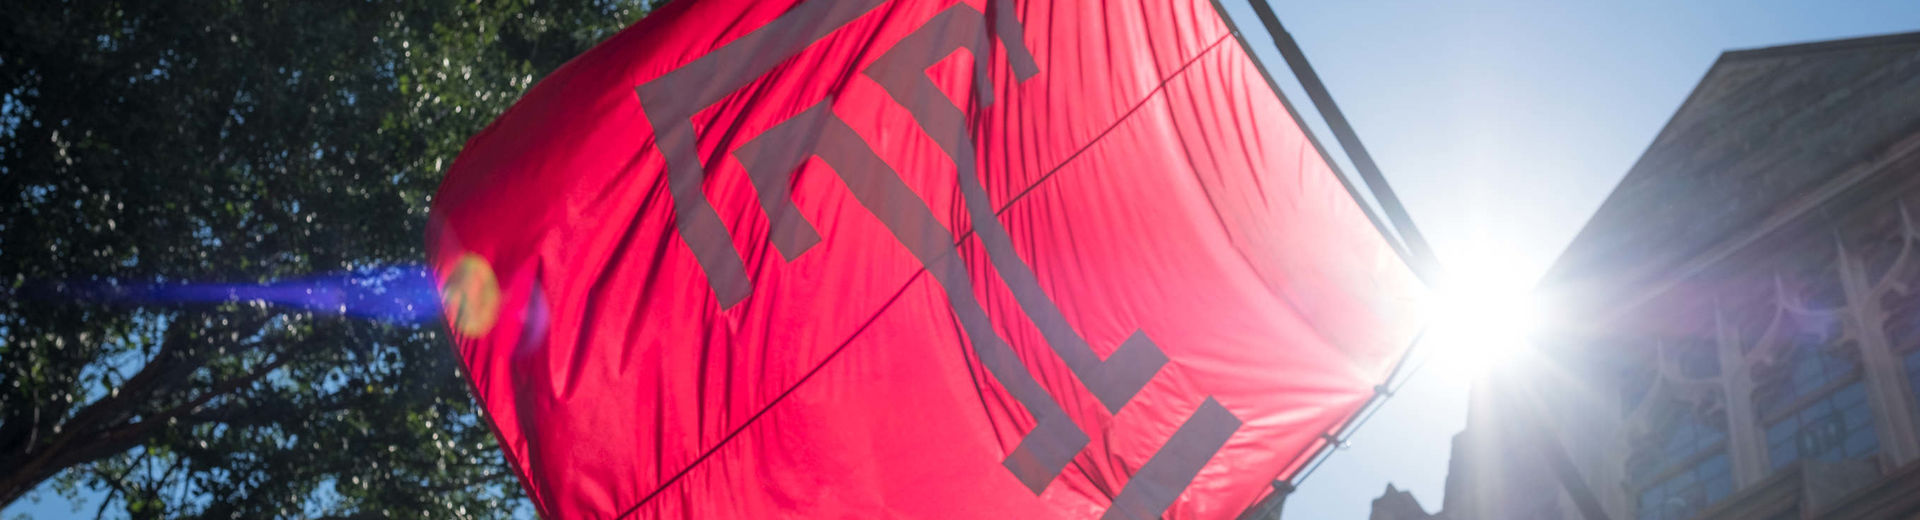 A Temple University flag flies in the summer sun.